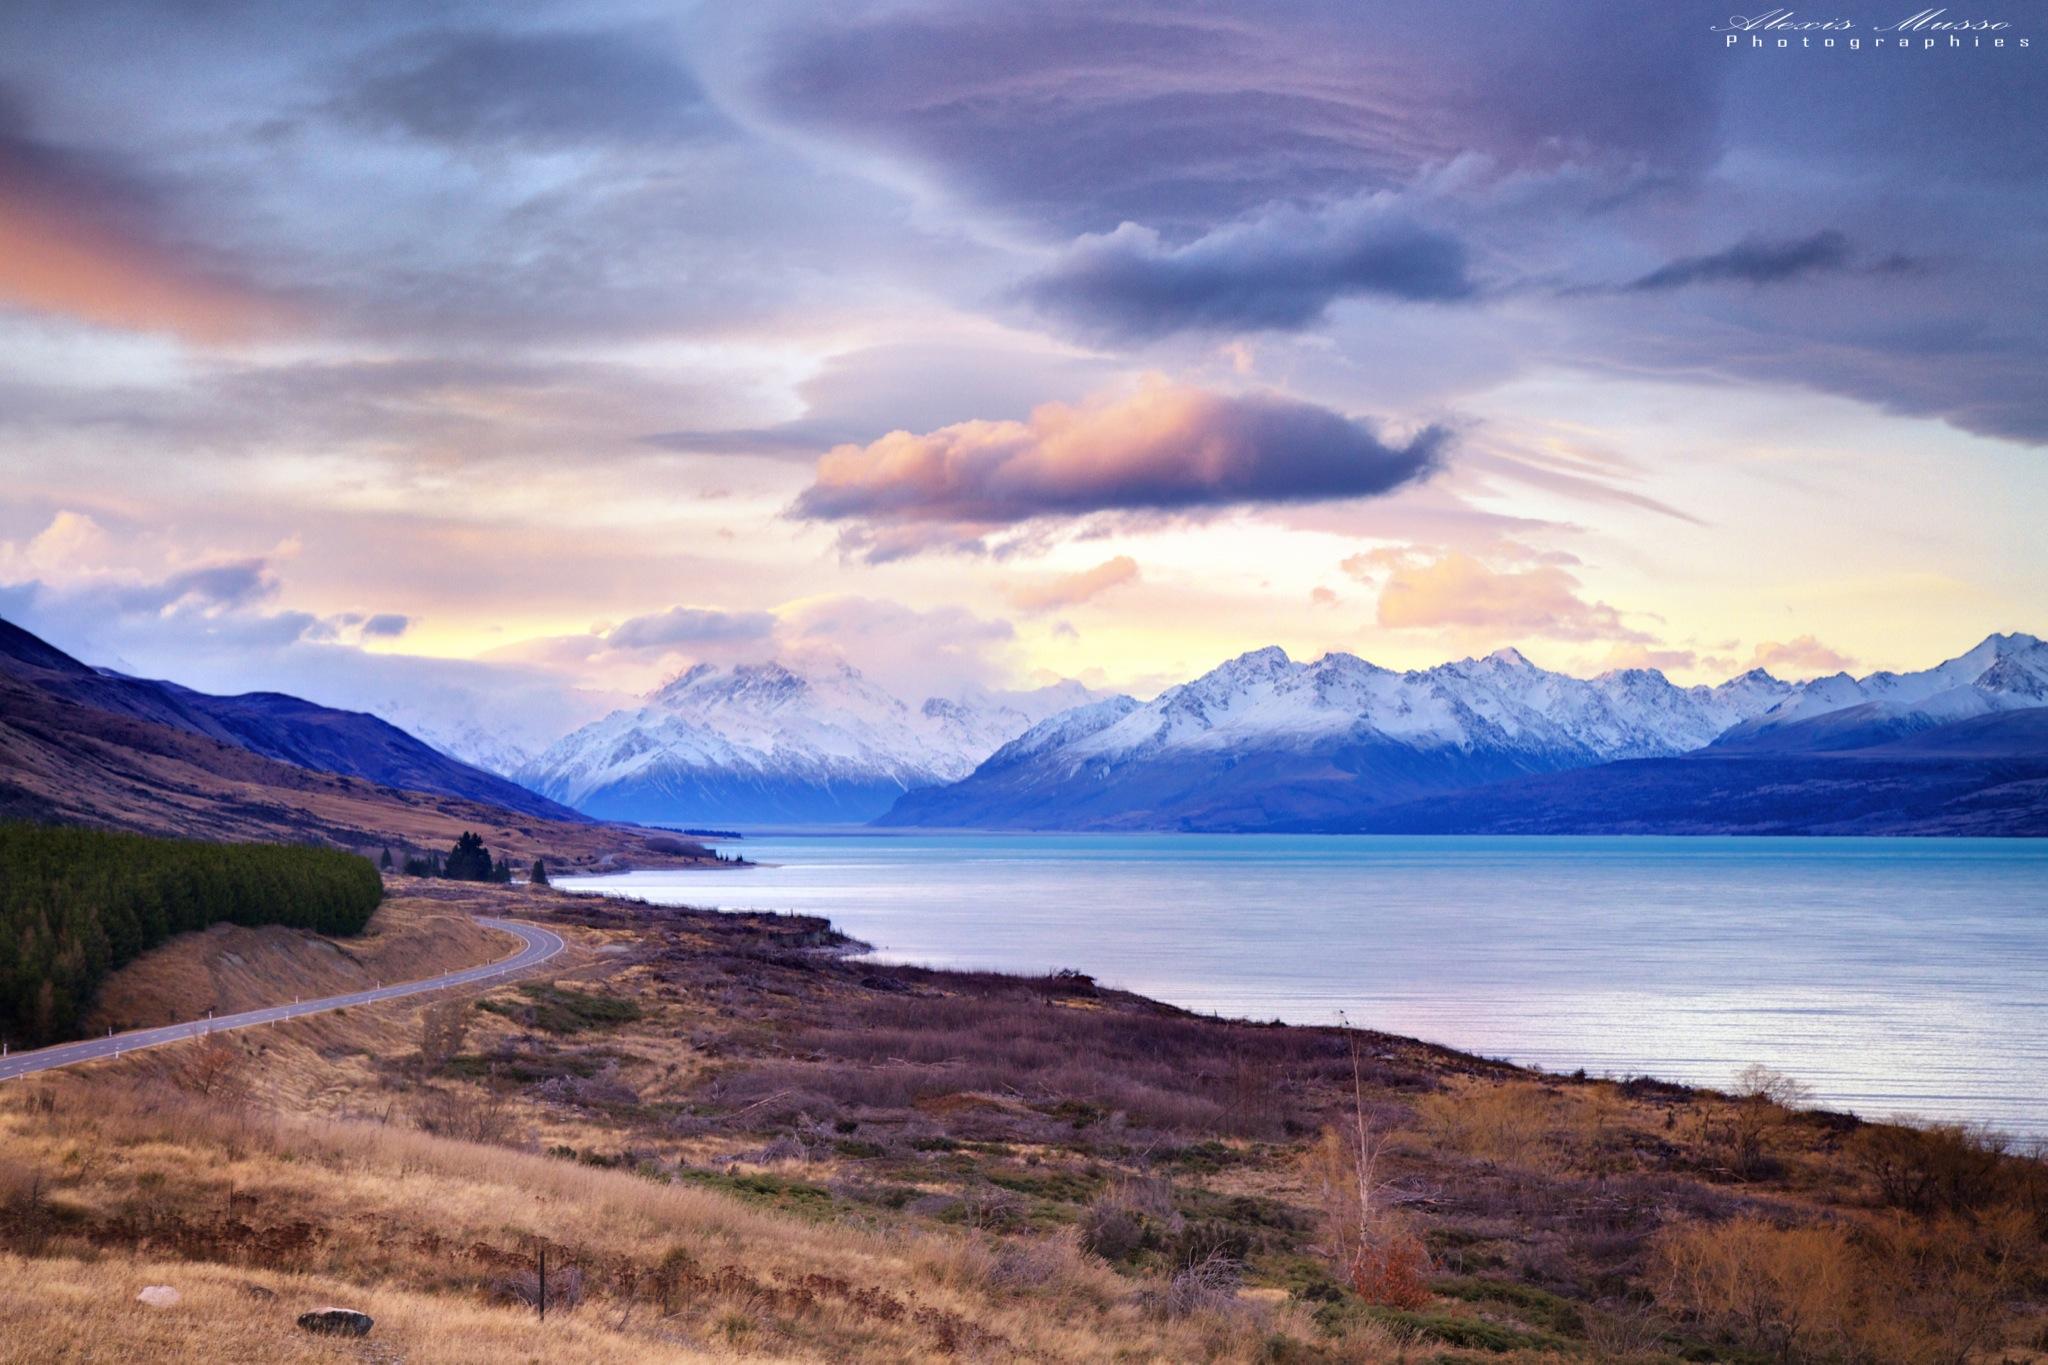 Lake Pukaki - Mt Cook Road, New Zealand